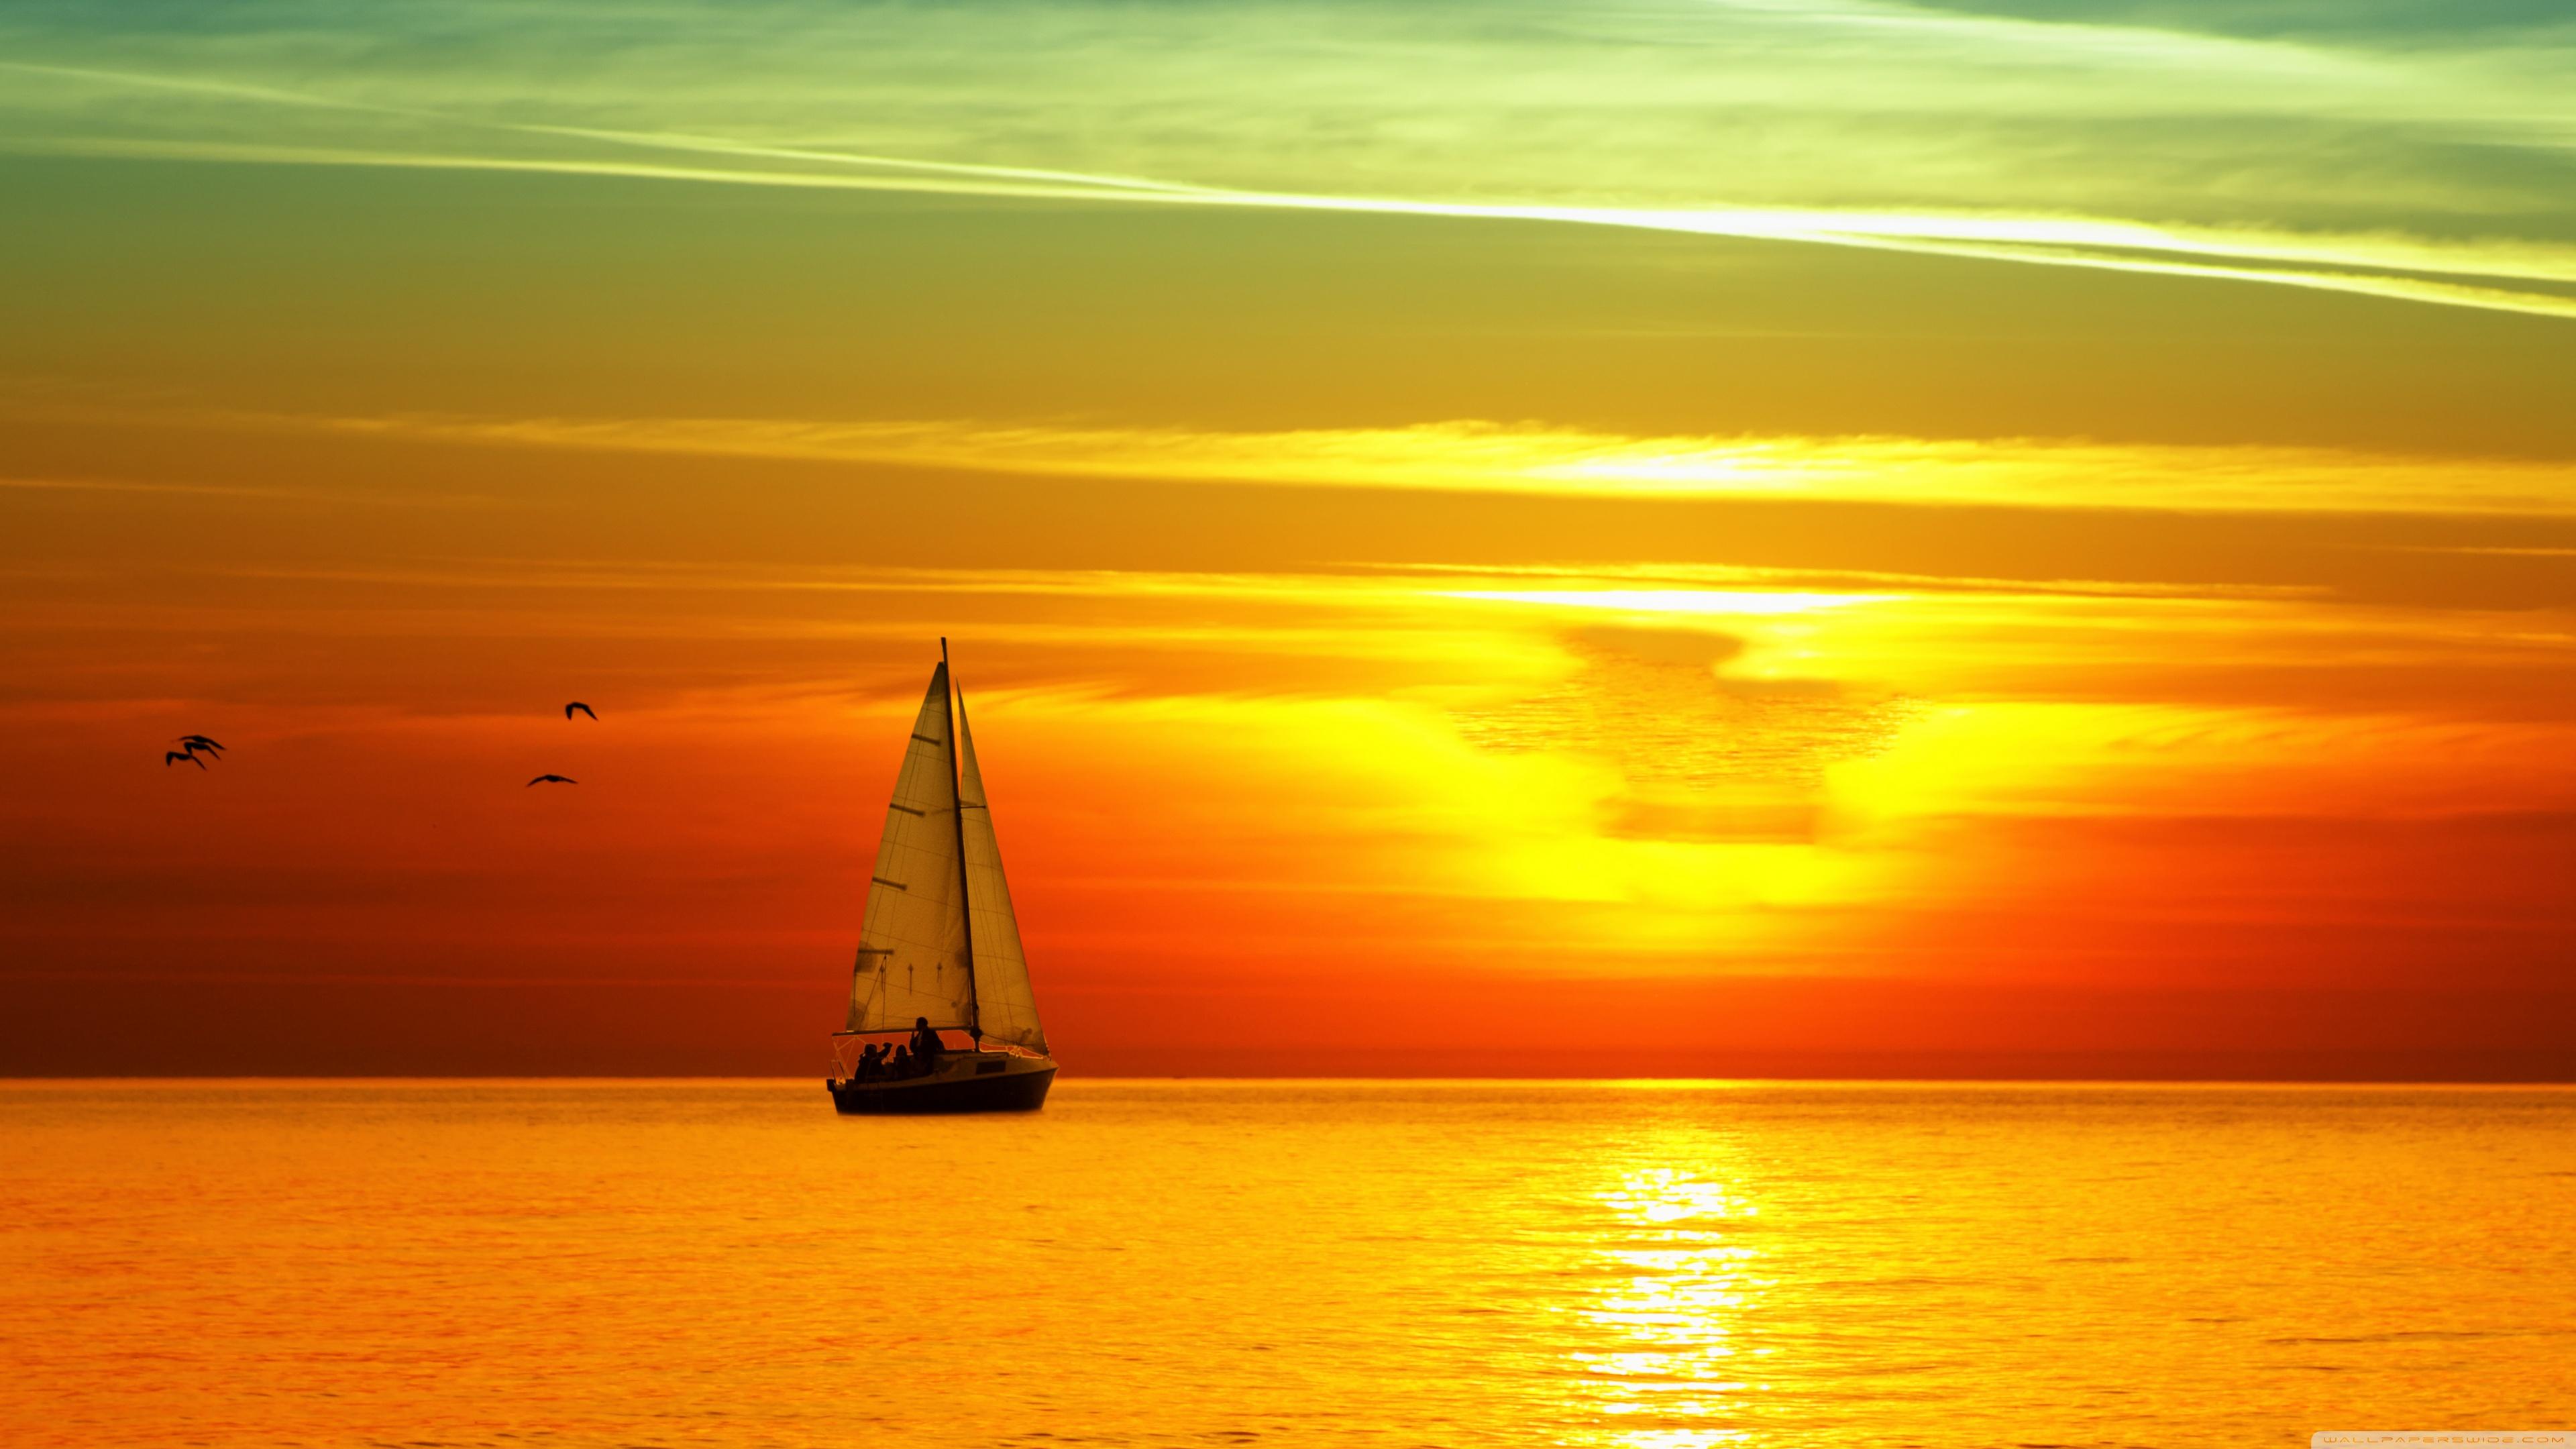 Sailing Boat At Sunset ❤ 4K HD Desktop Wallpaper for • Dual Monitor ...